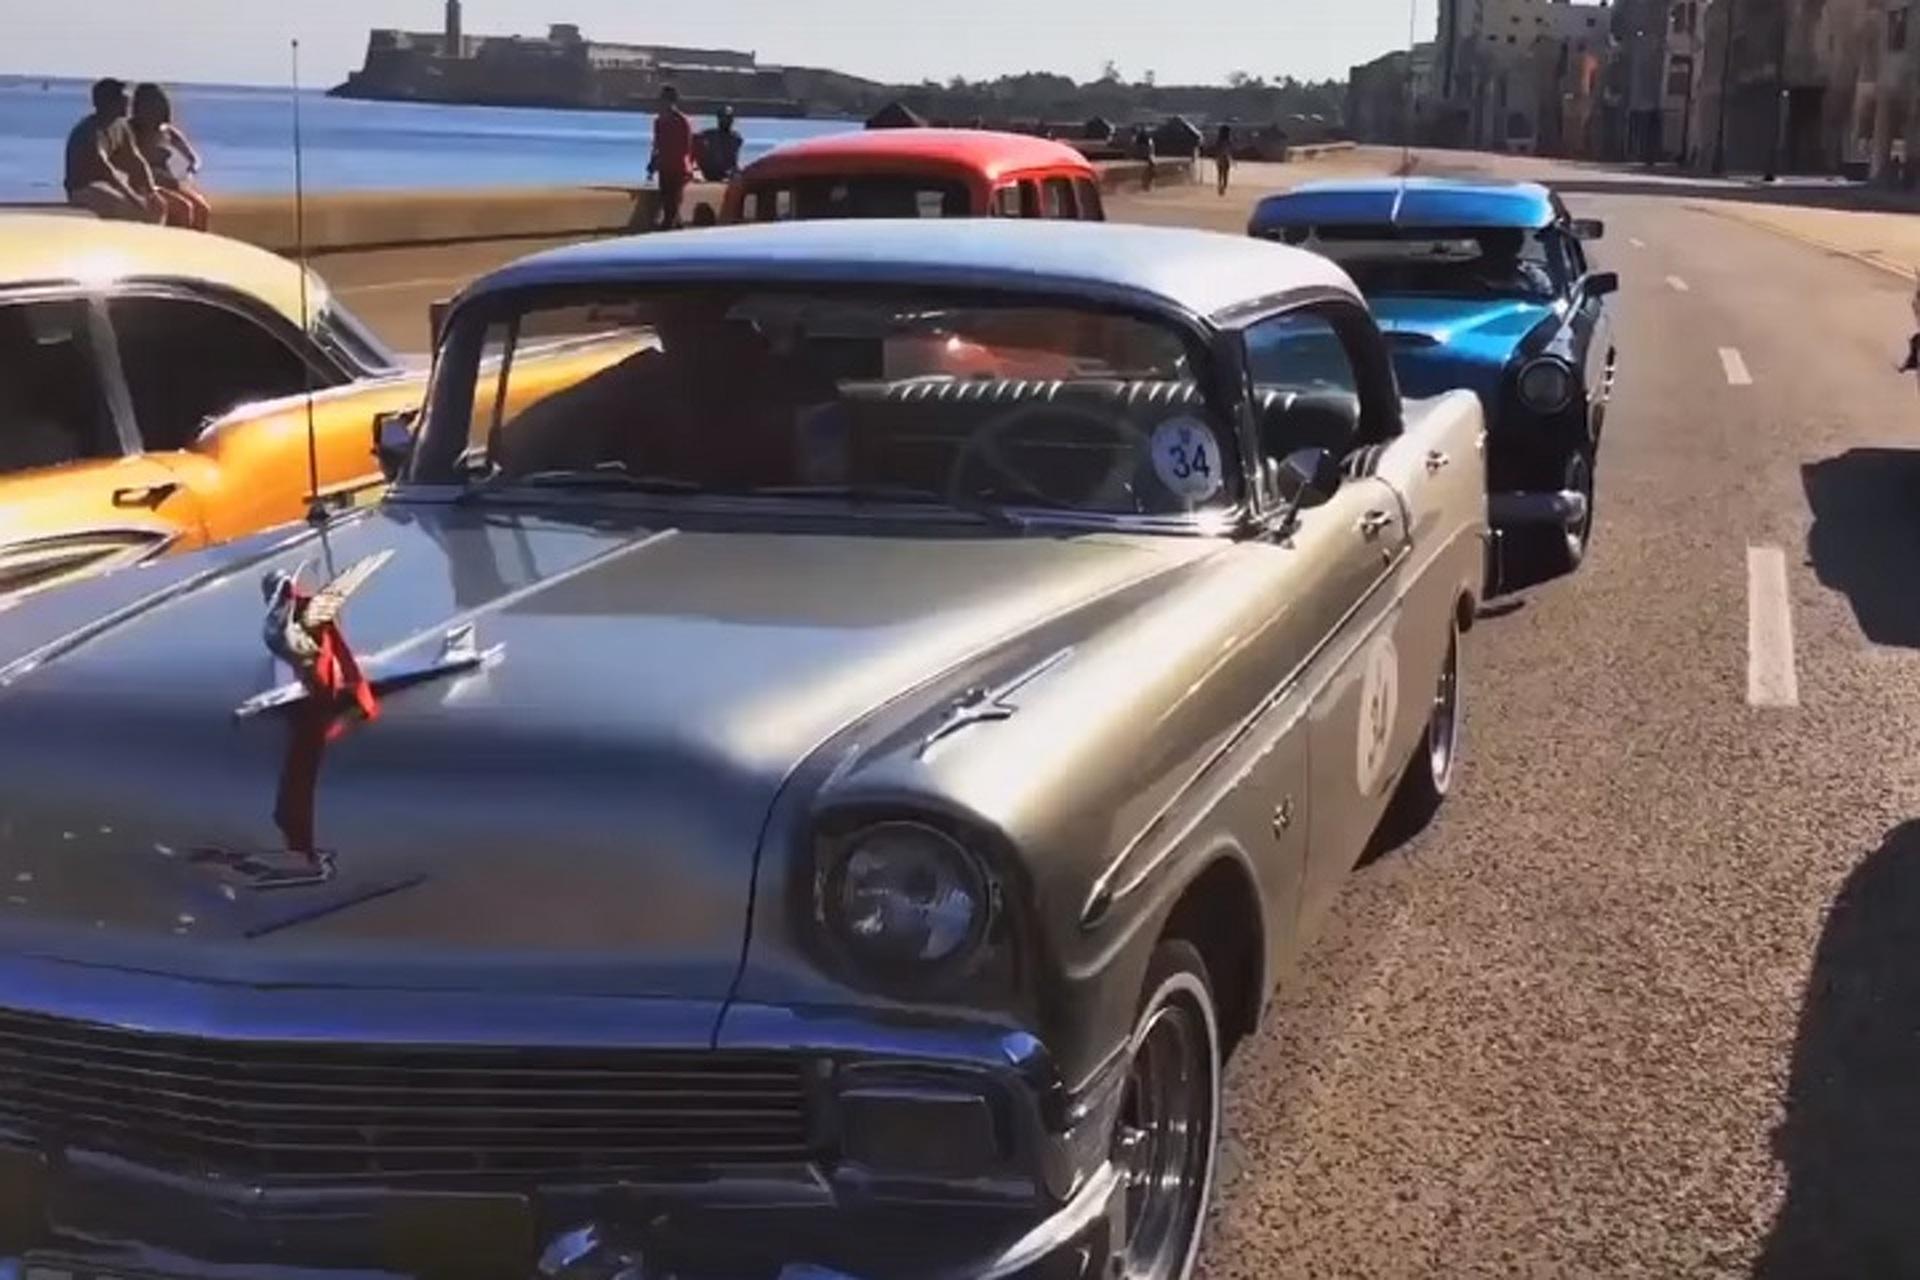 'Fast & Furious 8' Begins Filming in Cuba